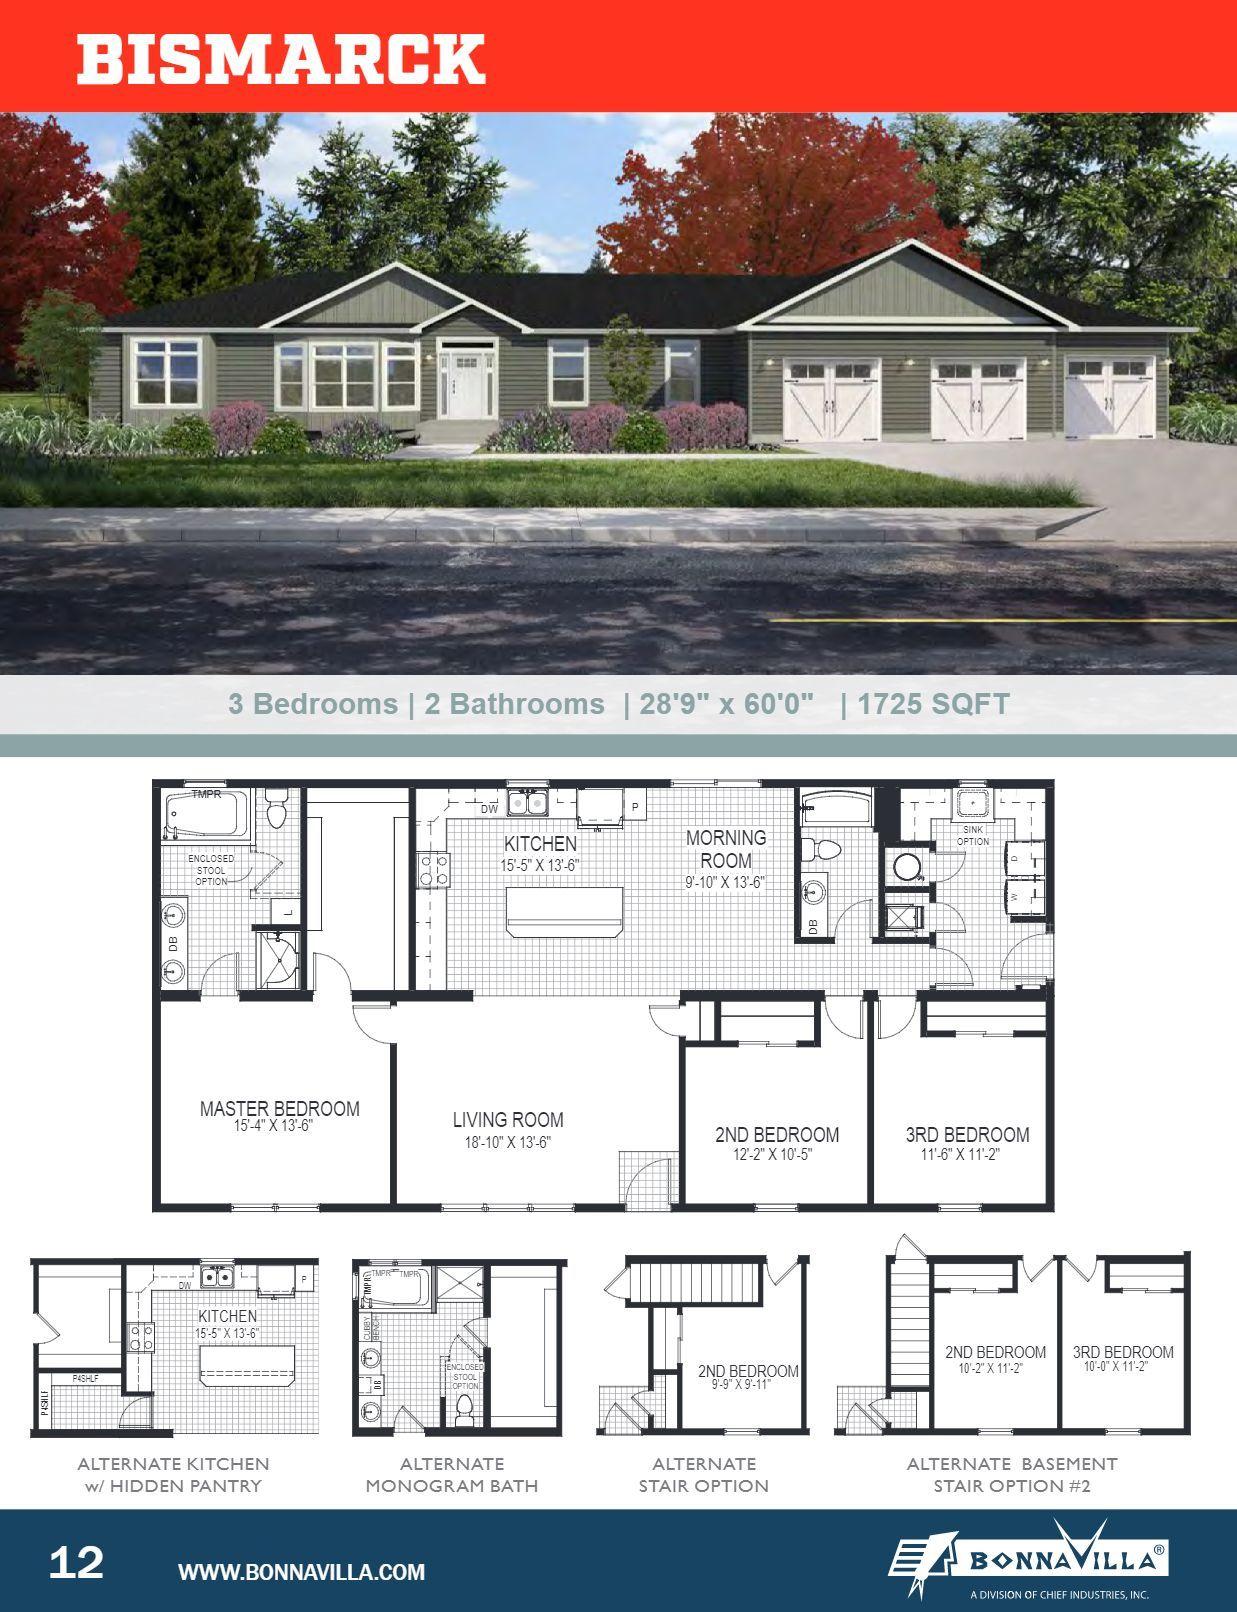 Great Western Homes Offsite Custom Built Manufactured Homes Manufactured Home Custom Built Homes Custom Build